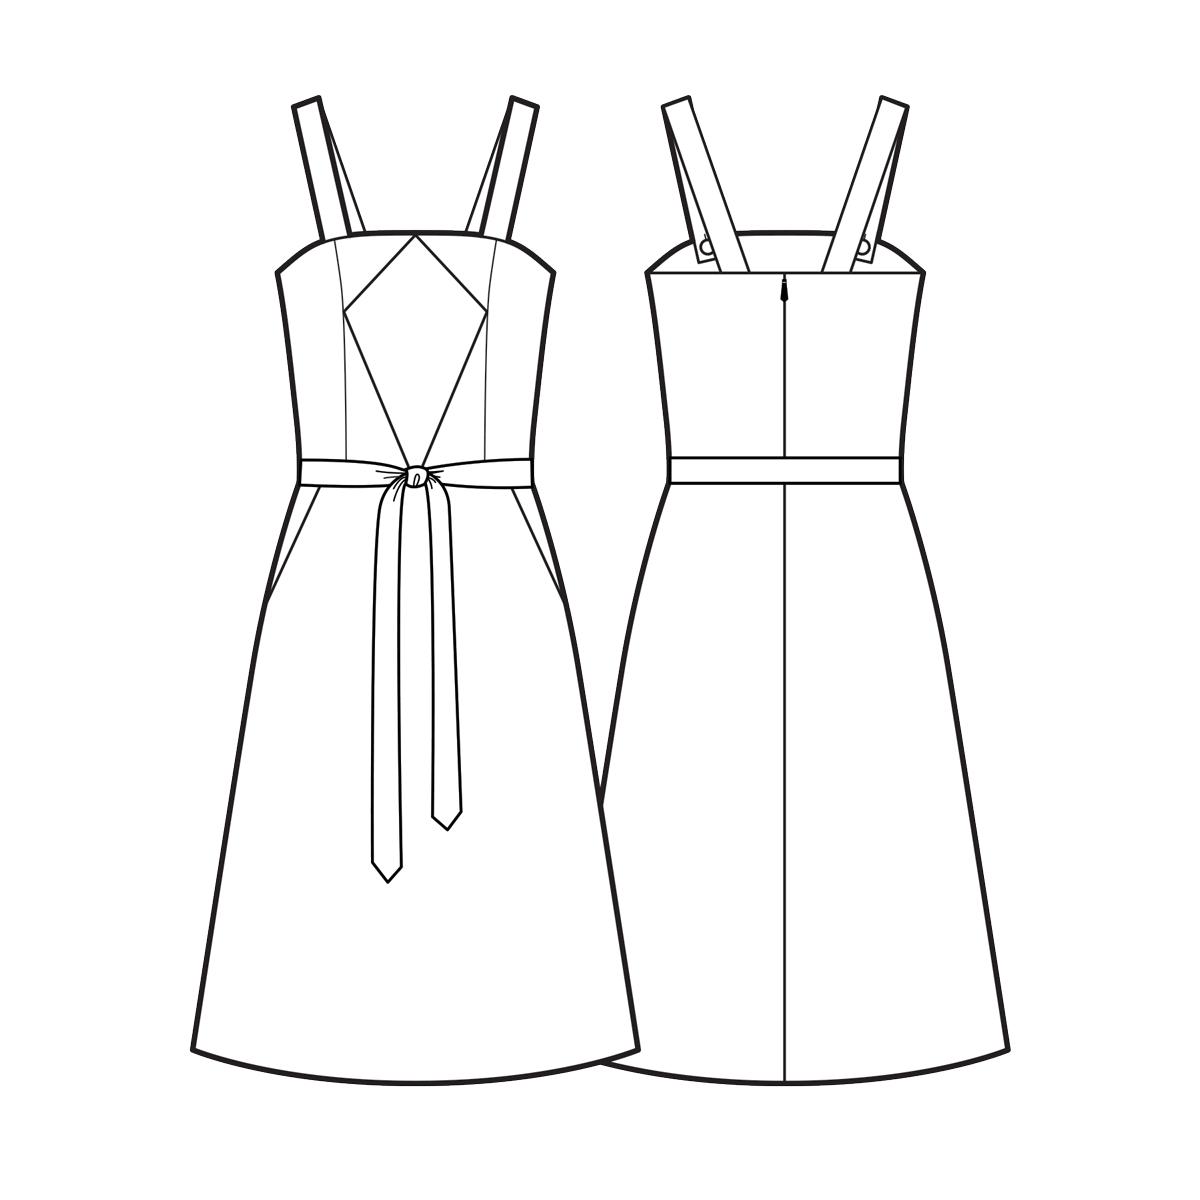 Diamond bodice dress with belt